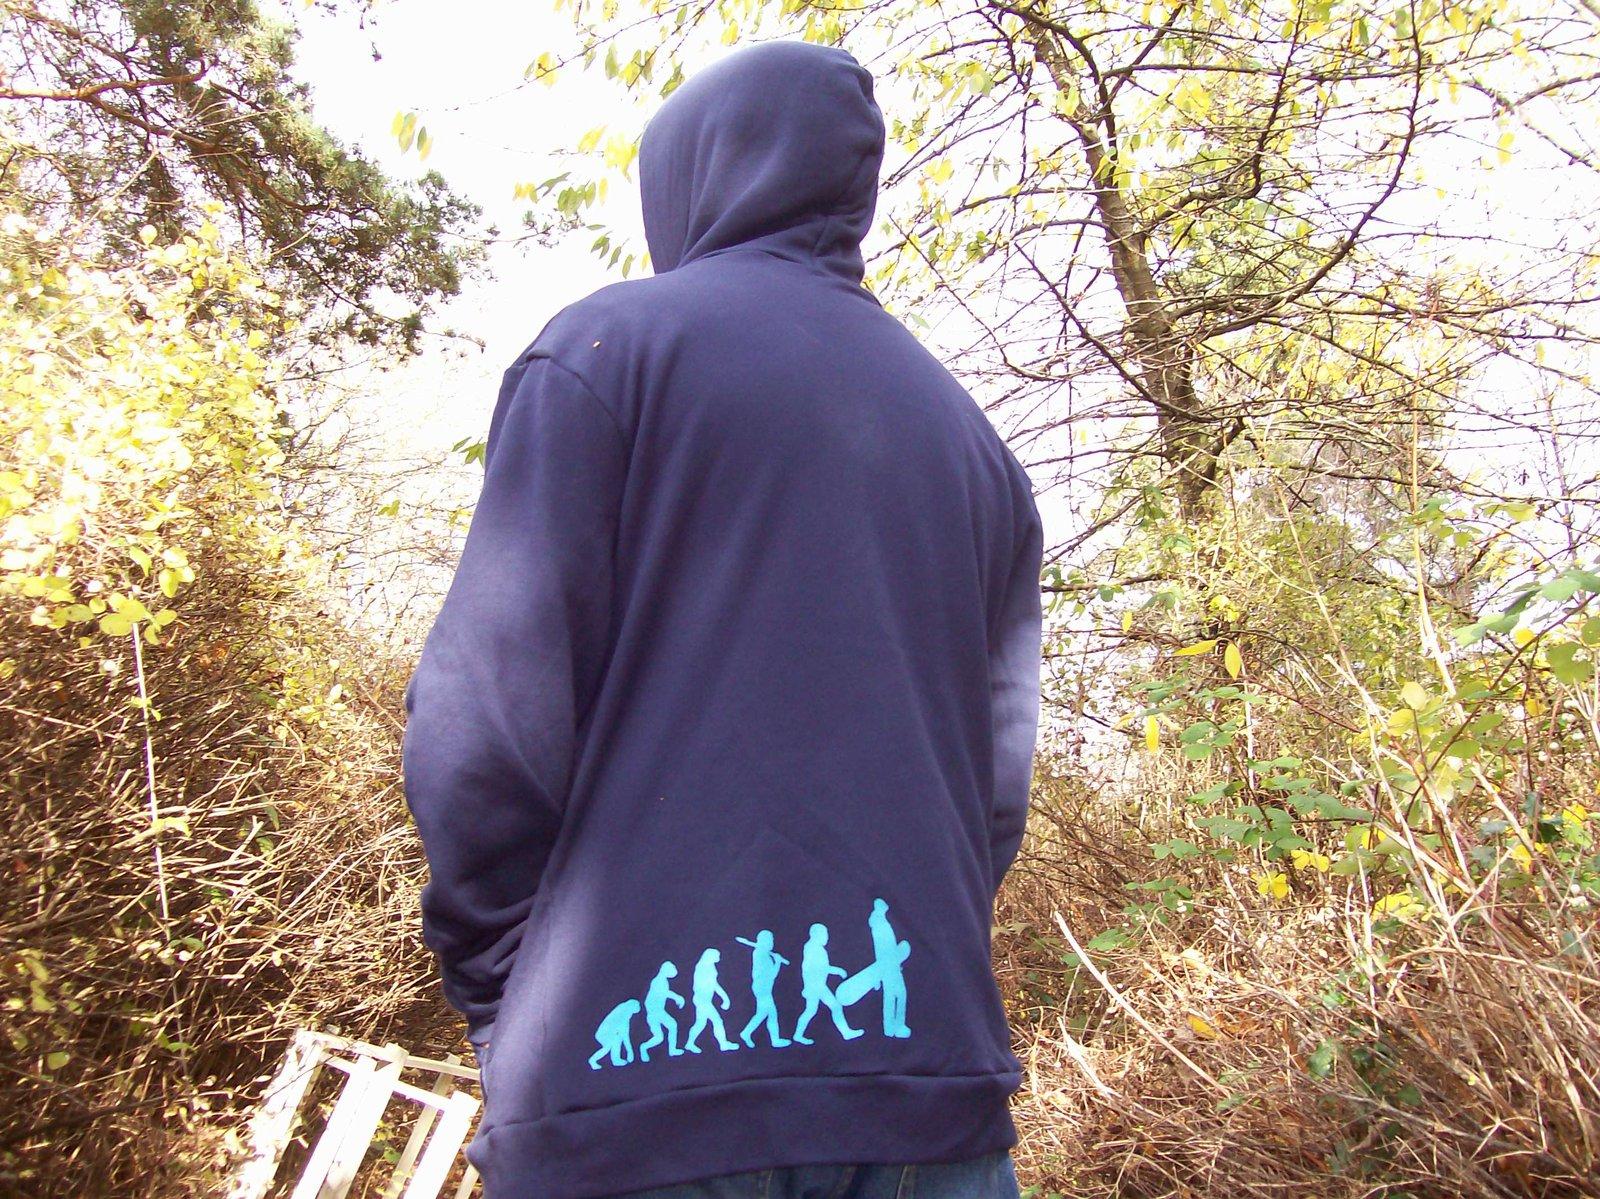 Mtn Milita Clothing - 4 of 16